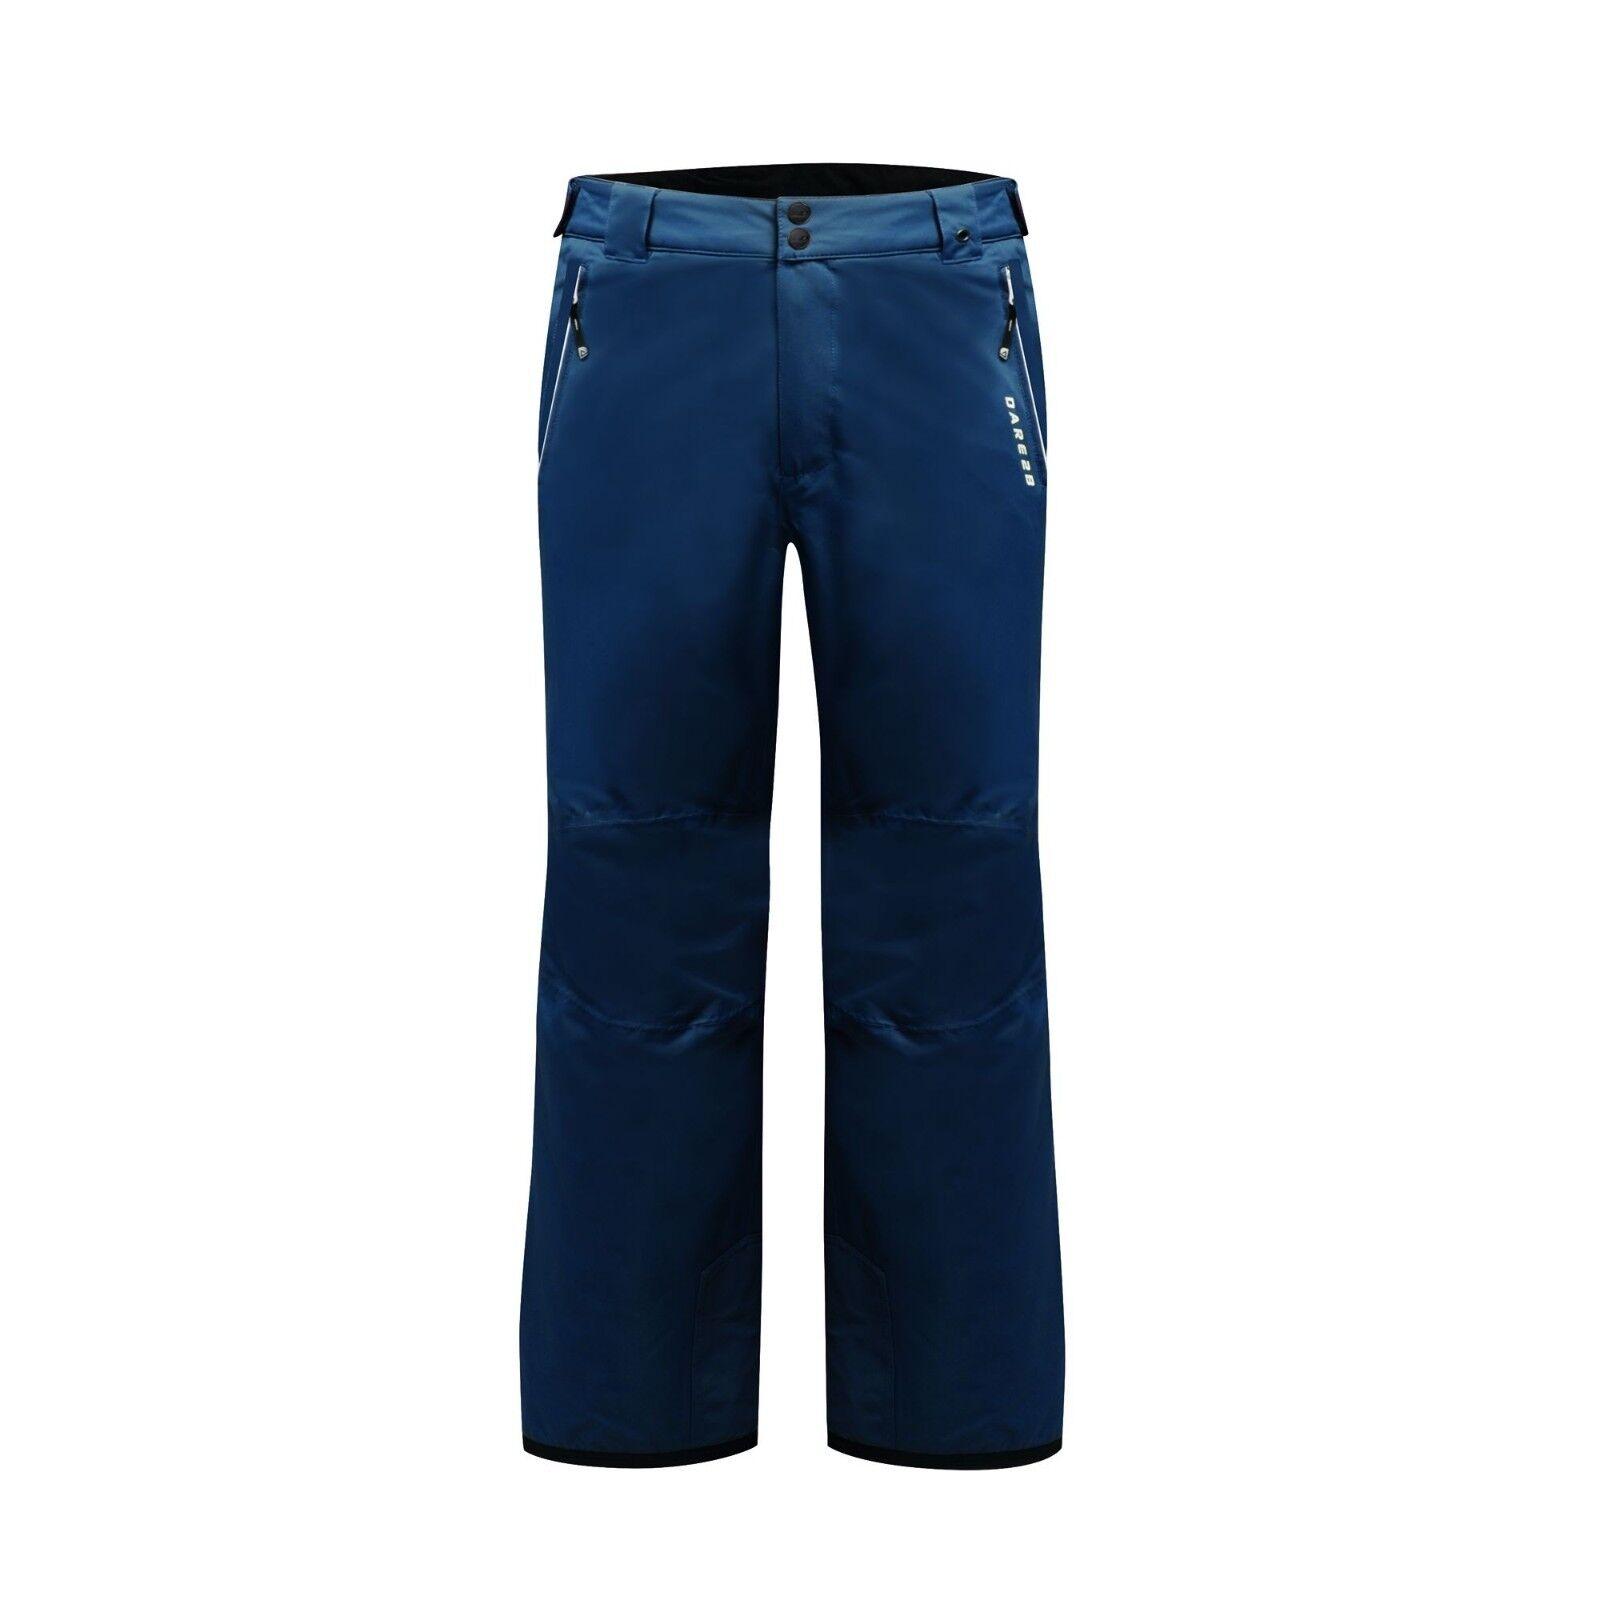 DARE 2B MENS KEEP UP II SKI SALOPETTES PANTS 5000R ADMIRAL blueE SHORT LEG